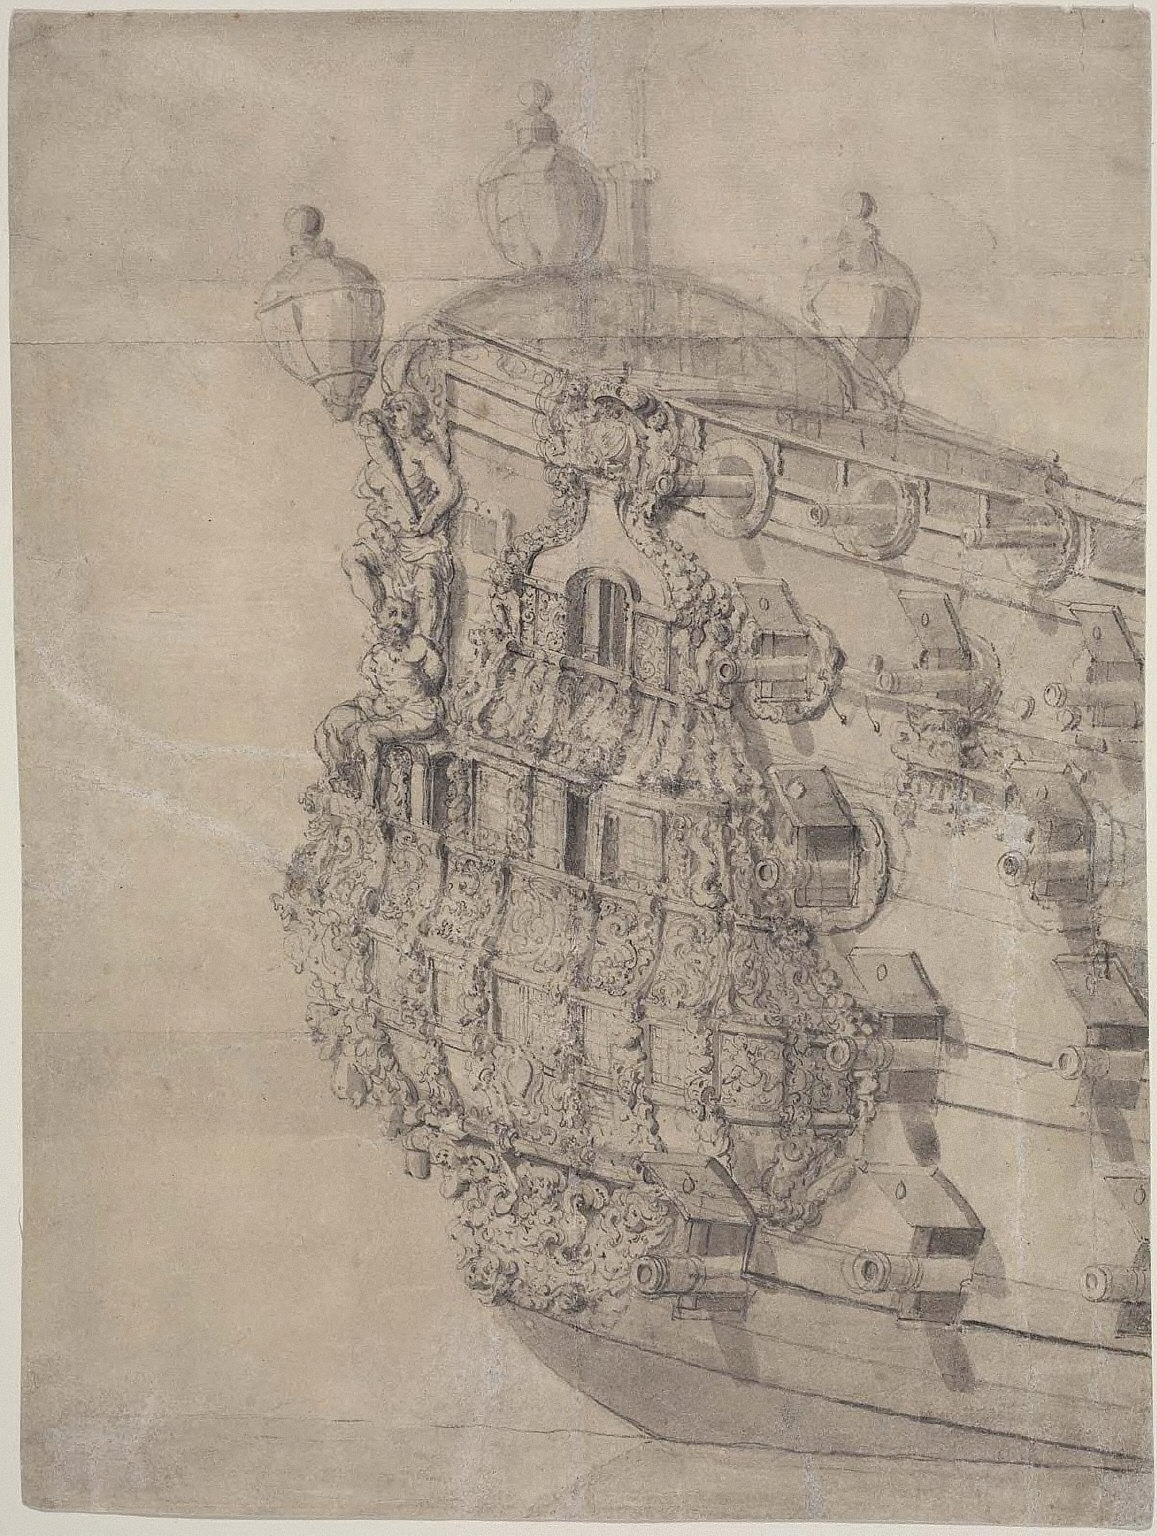 Starboard Quarter-Gallery of English Man-o'-War